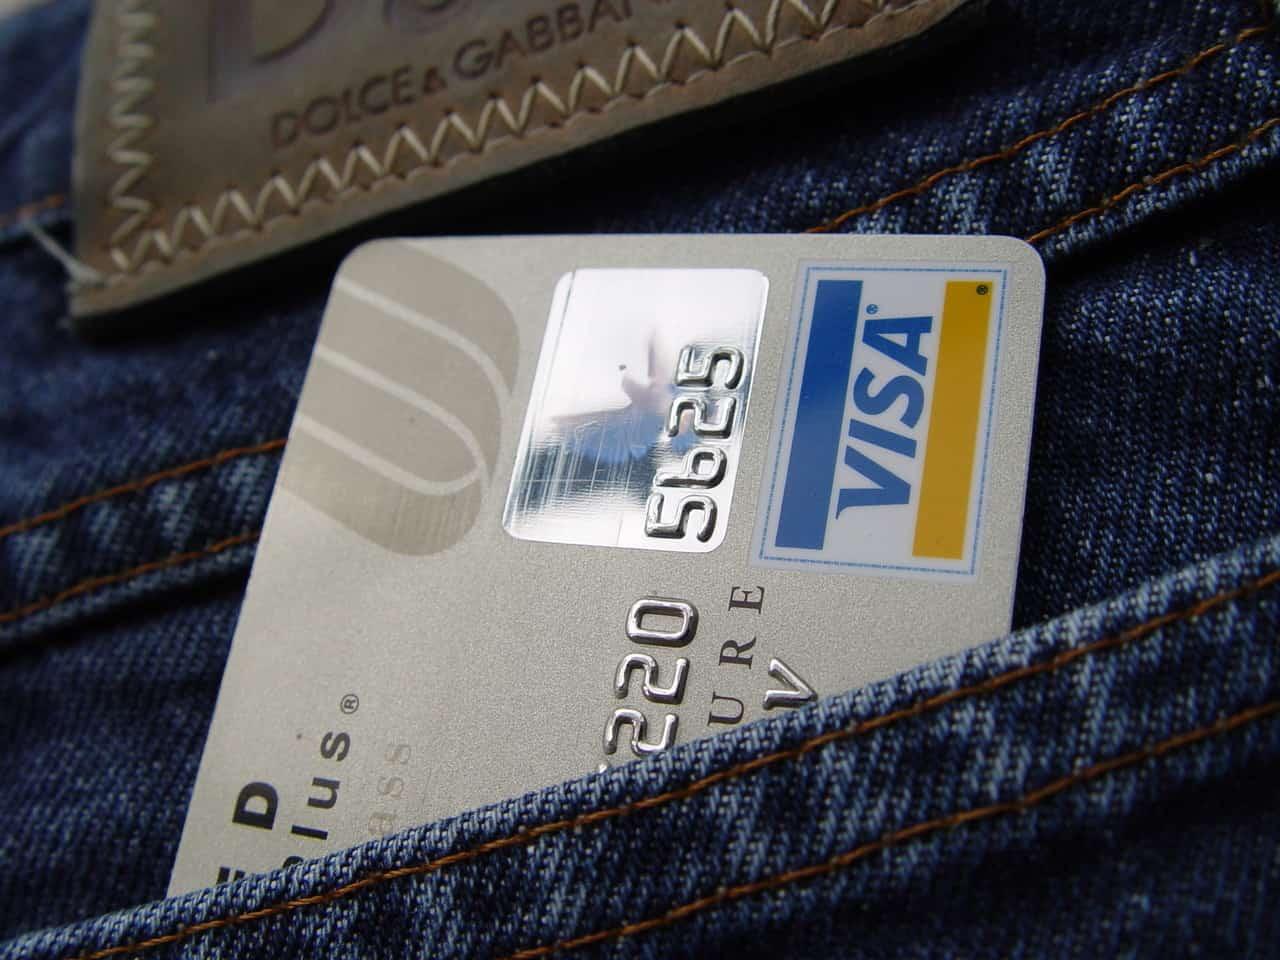 cc-in-jeans-pocket